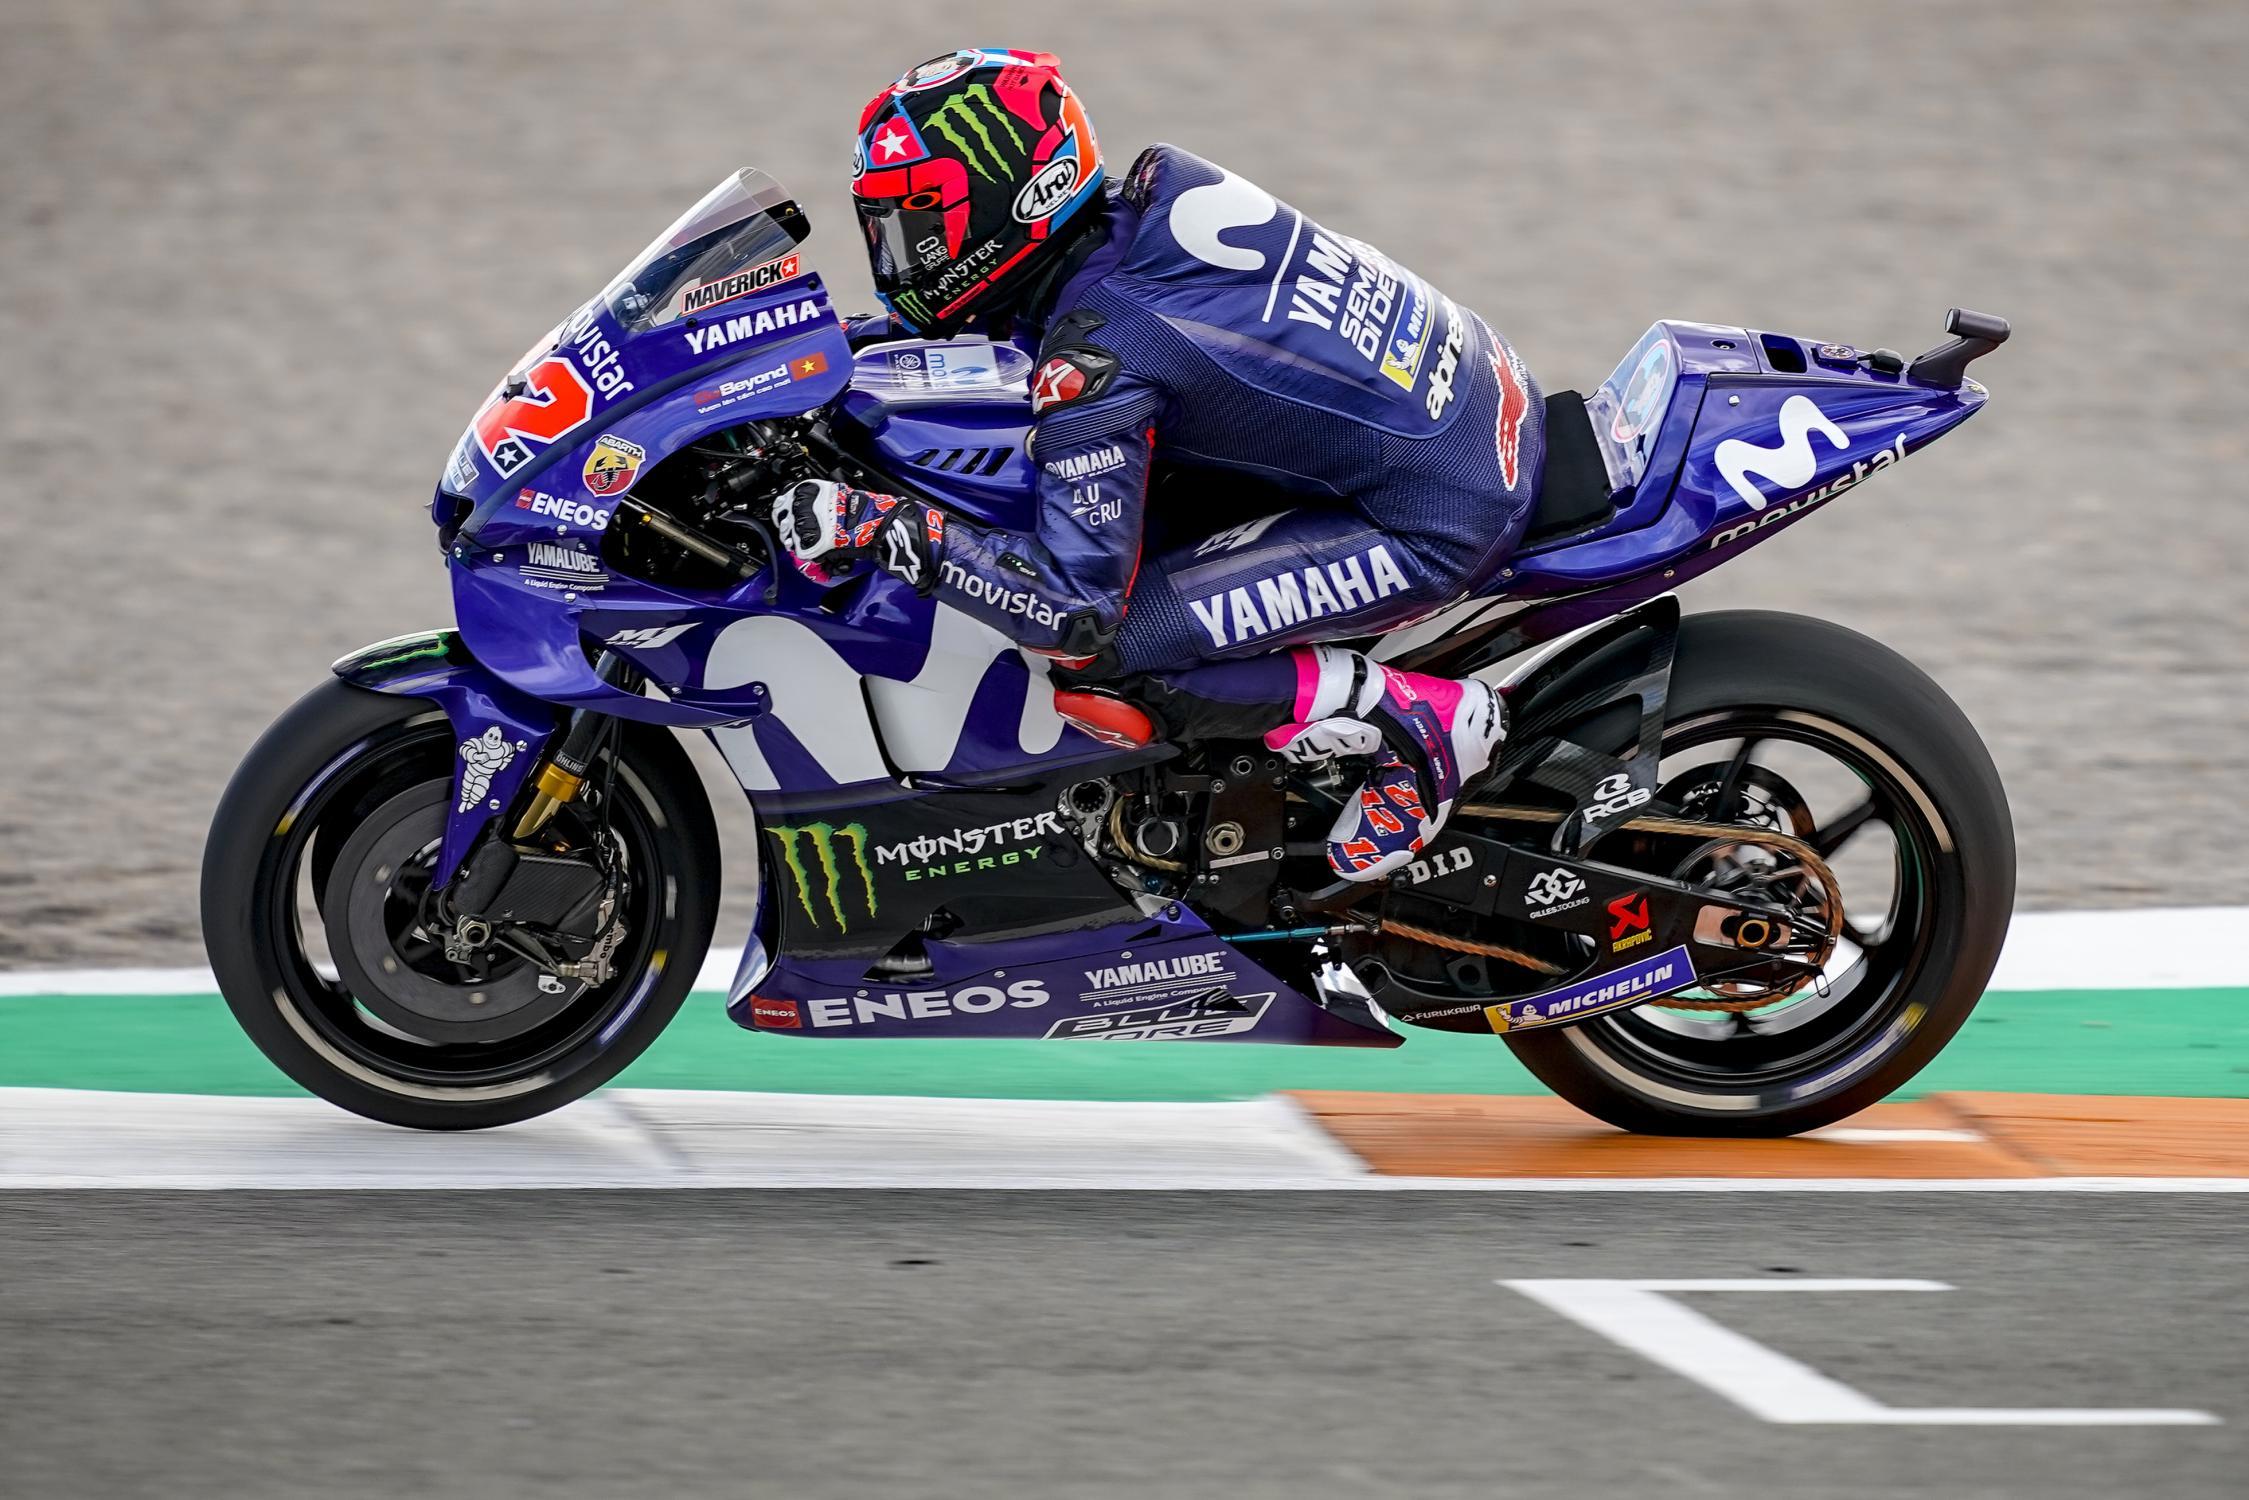 MOTO GP 2019 COMPÉTITIONS Maverick-vinales-valenciatest-j2-motogp-2018